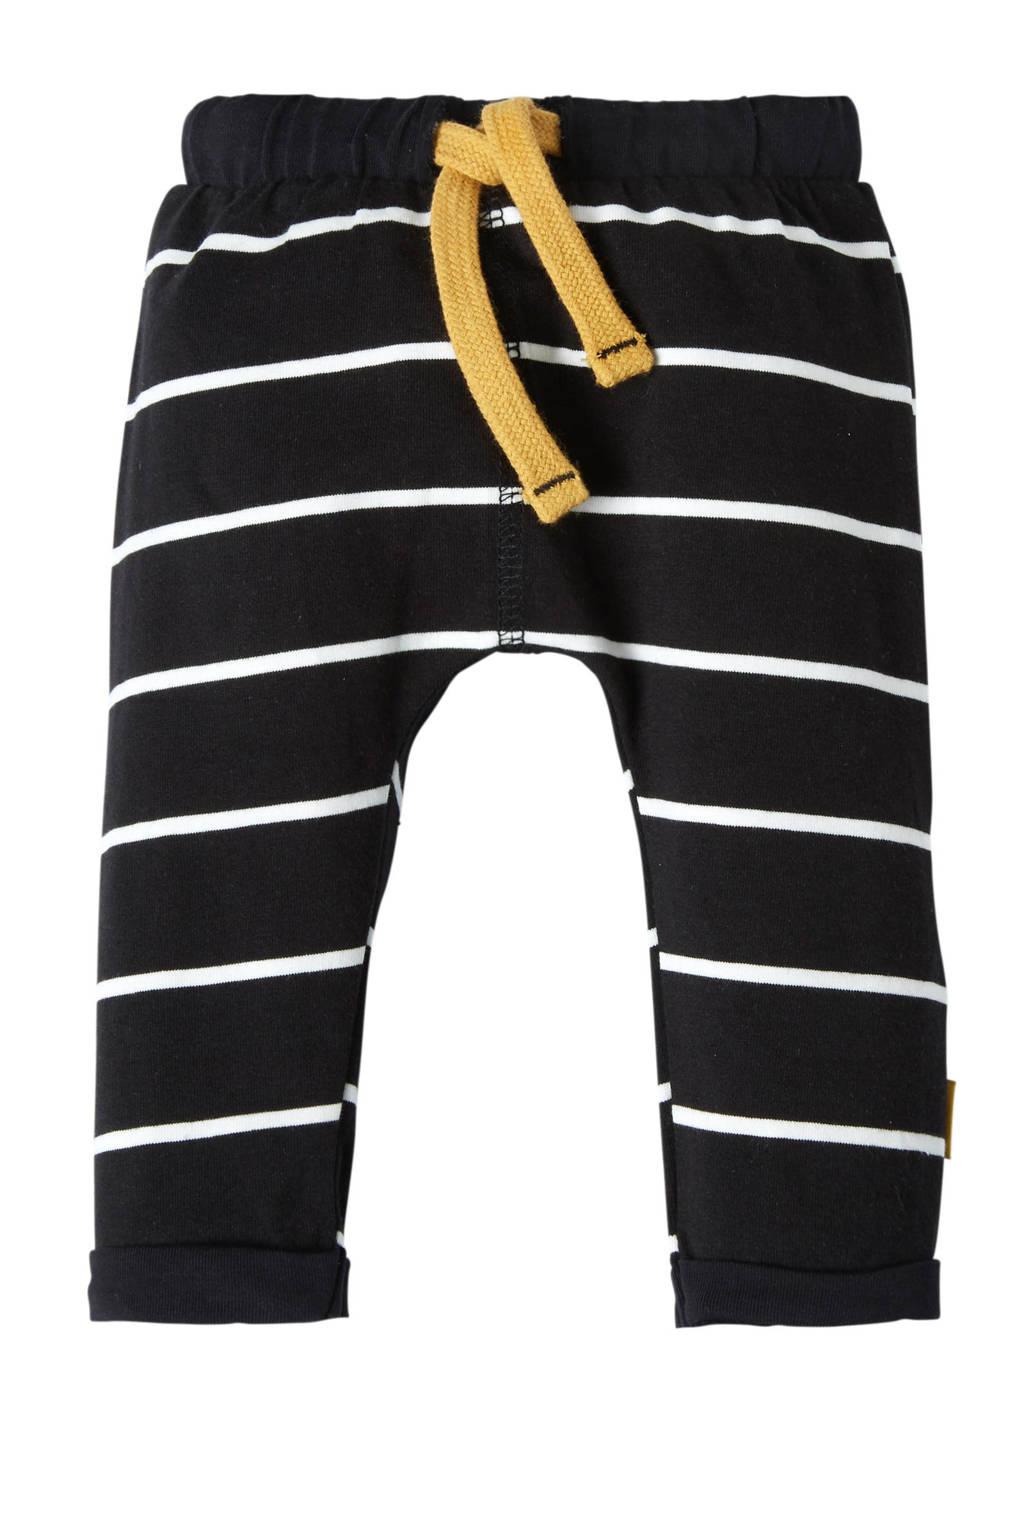 B.E.S.S newborn gestreepte broek zwart, Zwart/wit